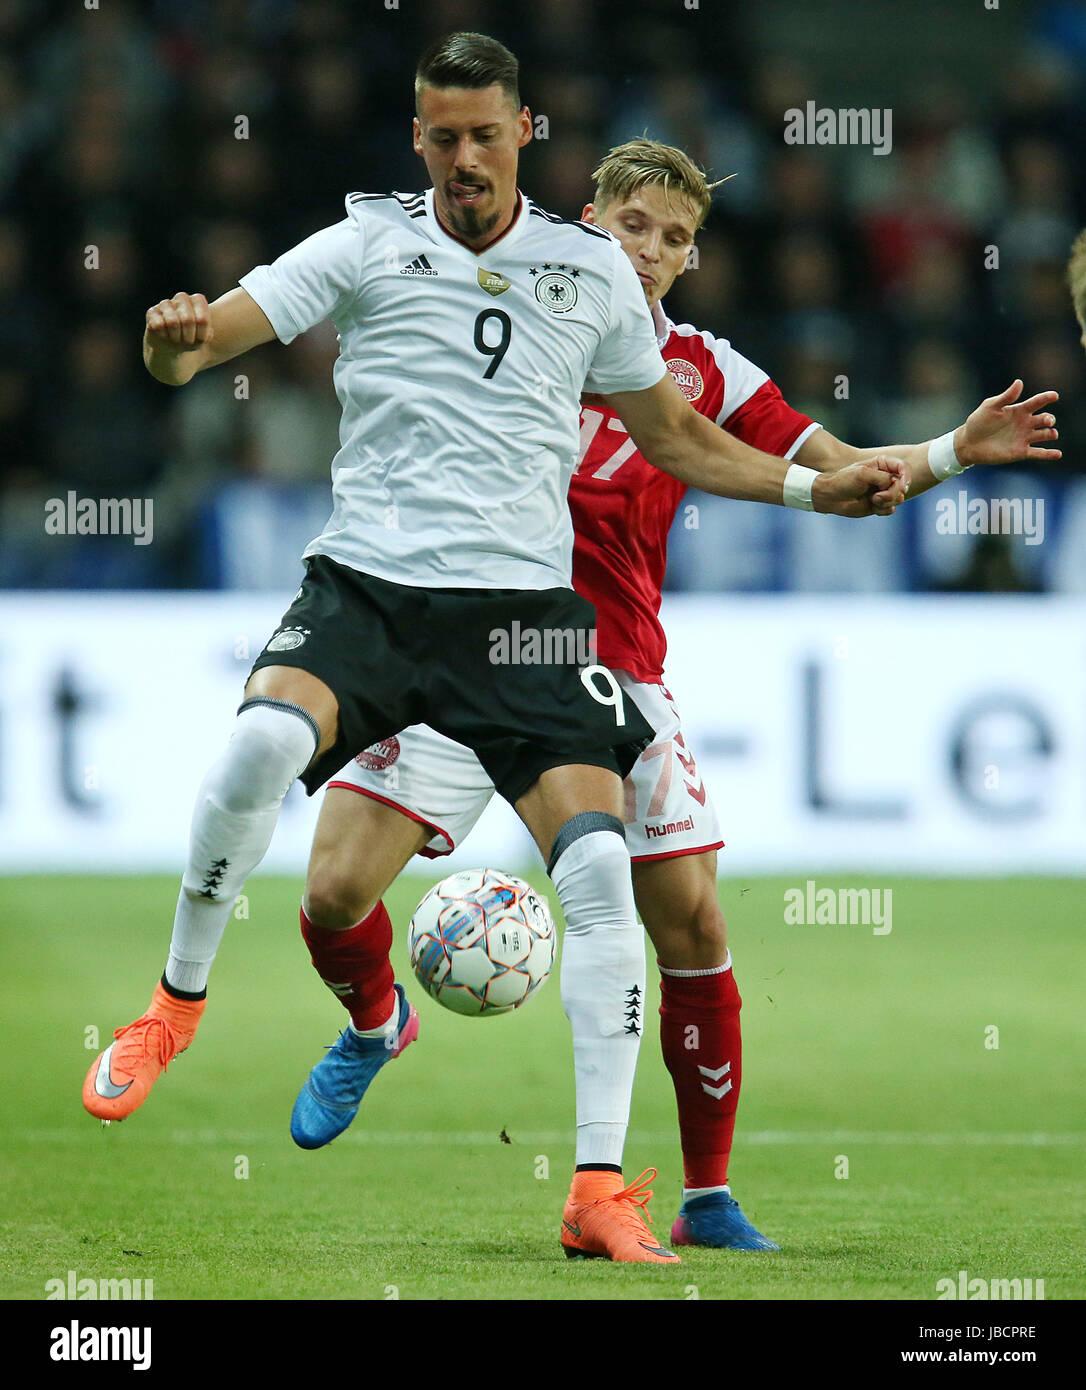 06.06.2017, Fussball Länderspiel, Dänemark - Deutschland, in Brondby Stadion Kopenhagen, v.l. Sandro Wagner (Deutschland) Stock Photo